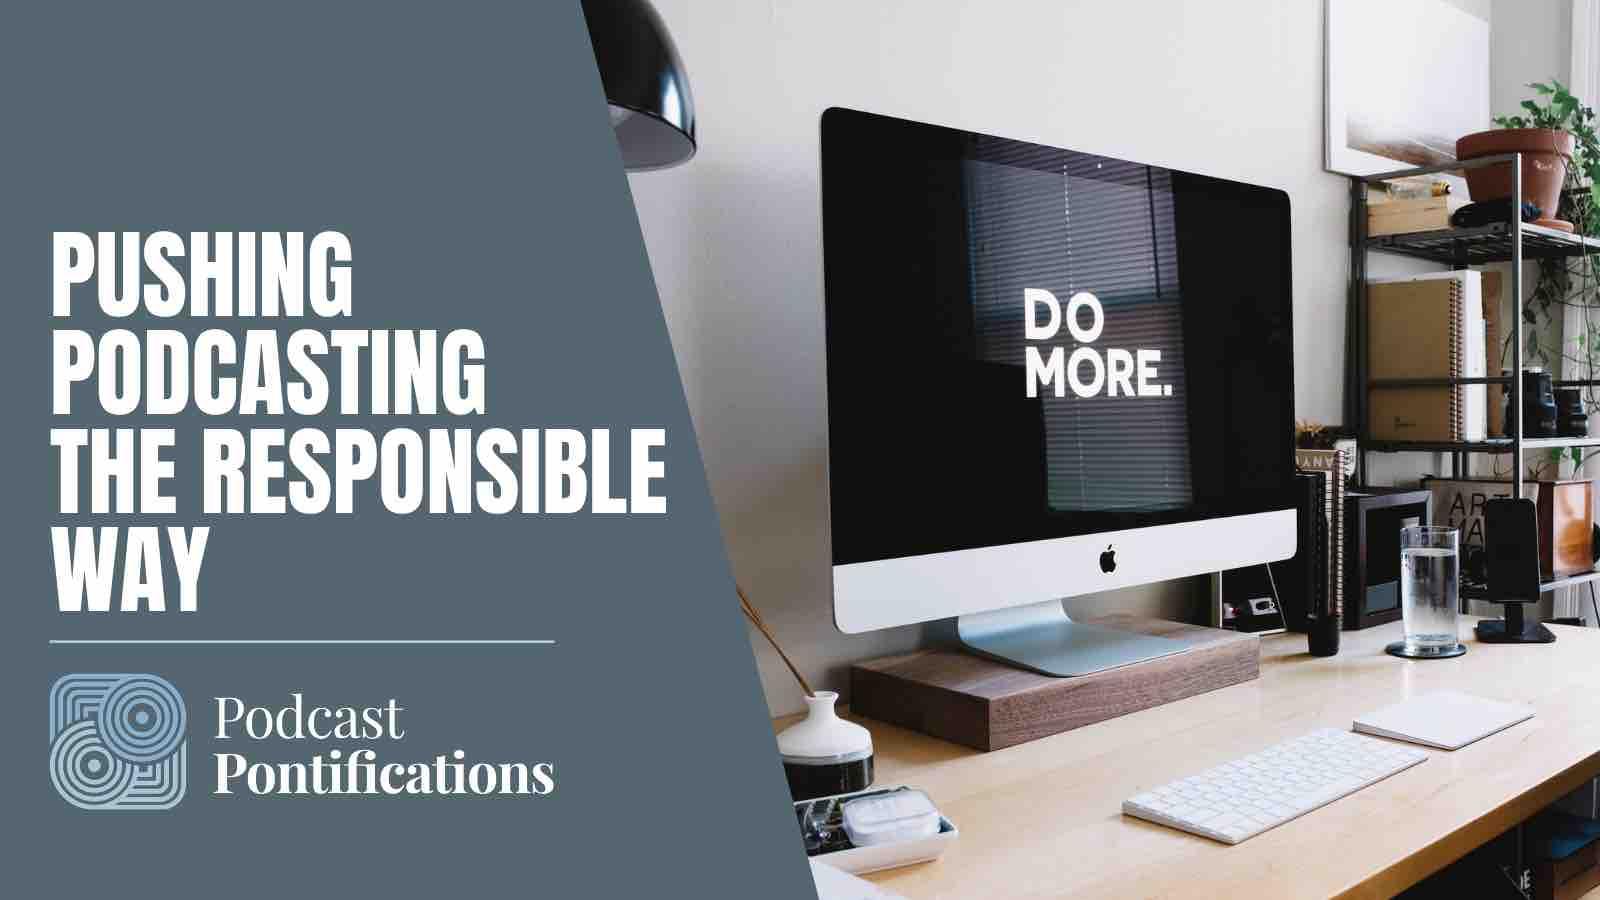 Pushing Podcasting The Responsible Way